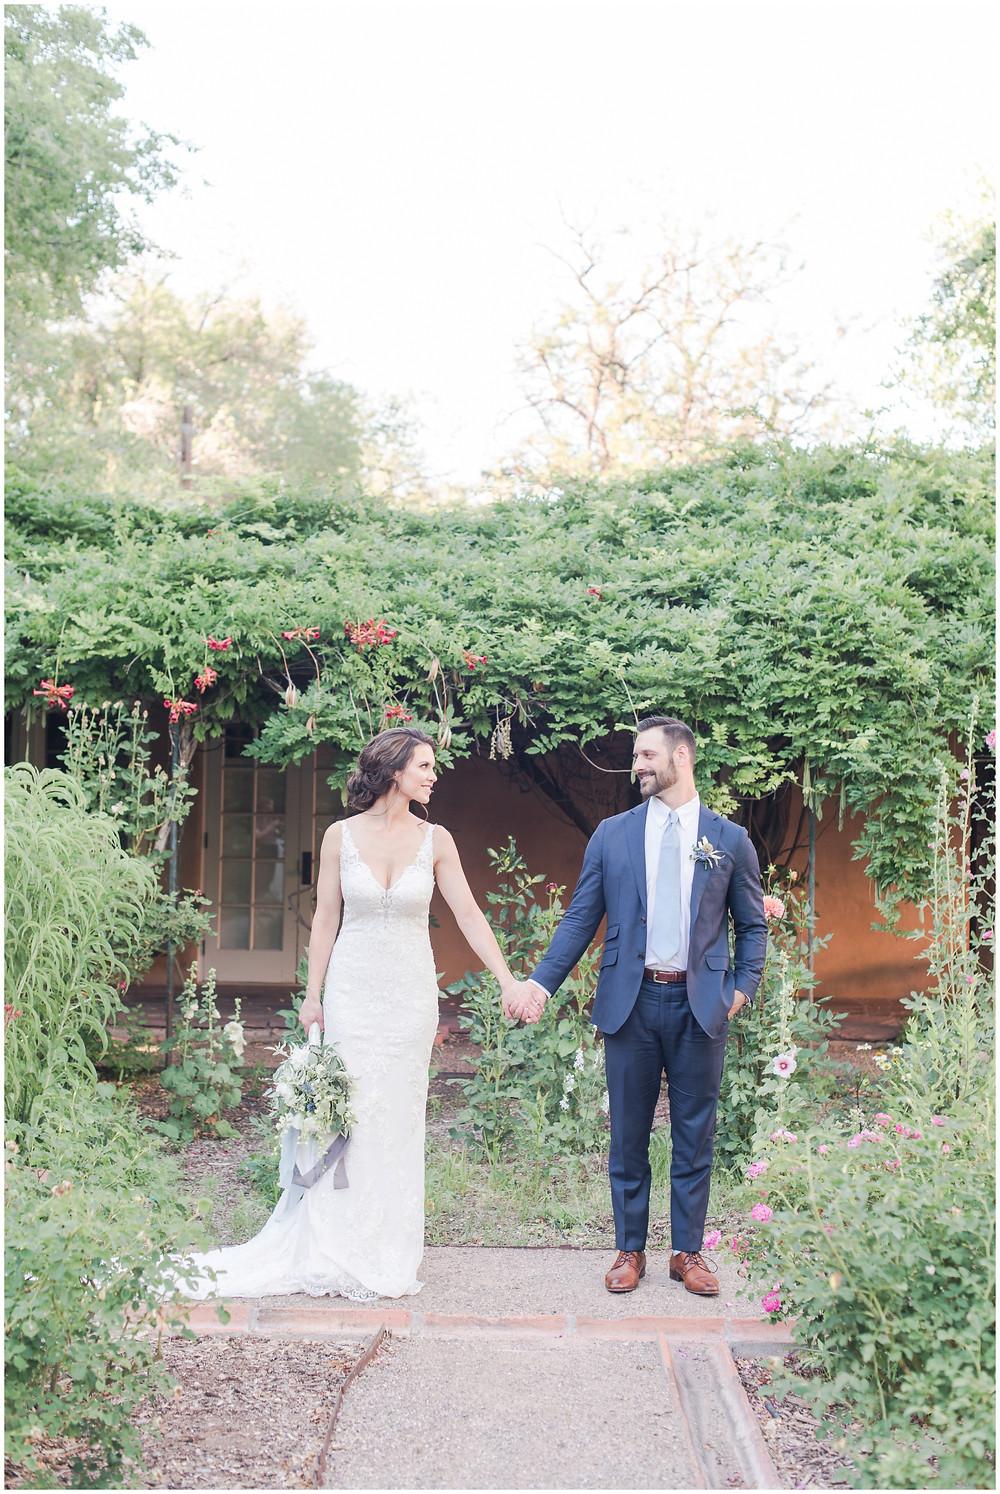 Wedding at Los poblanos. dusty blue wedding. new mexico wedding venue. outdoor wedding. spring wedding. albuquerque wedding. new mexico wedding photographer. maura jane photography.